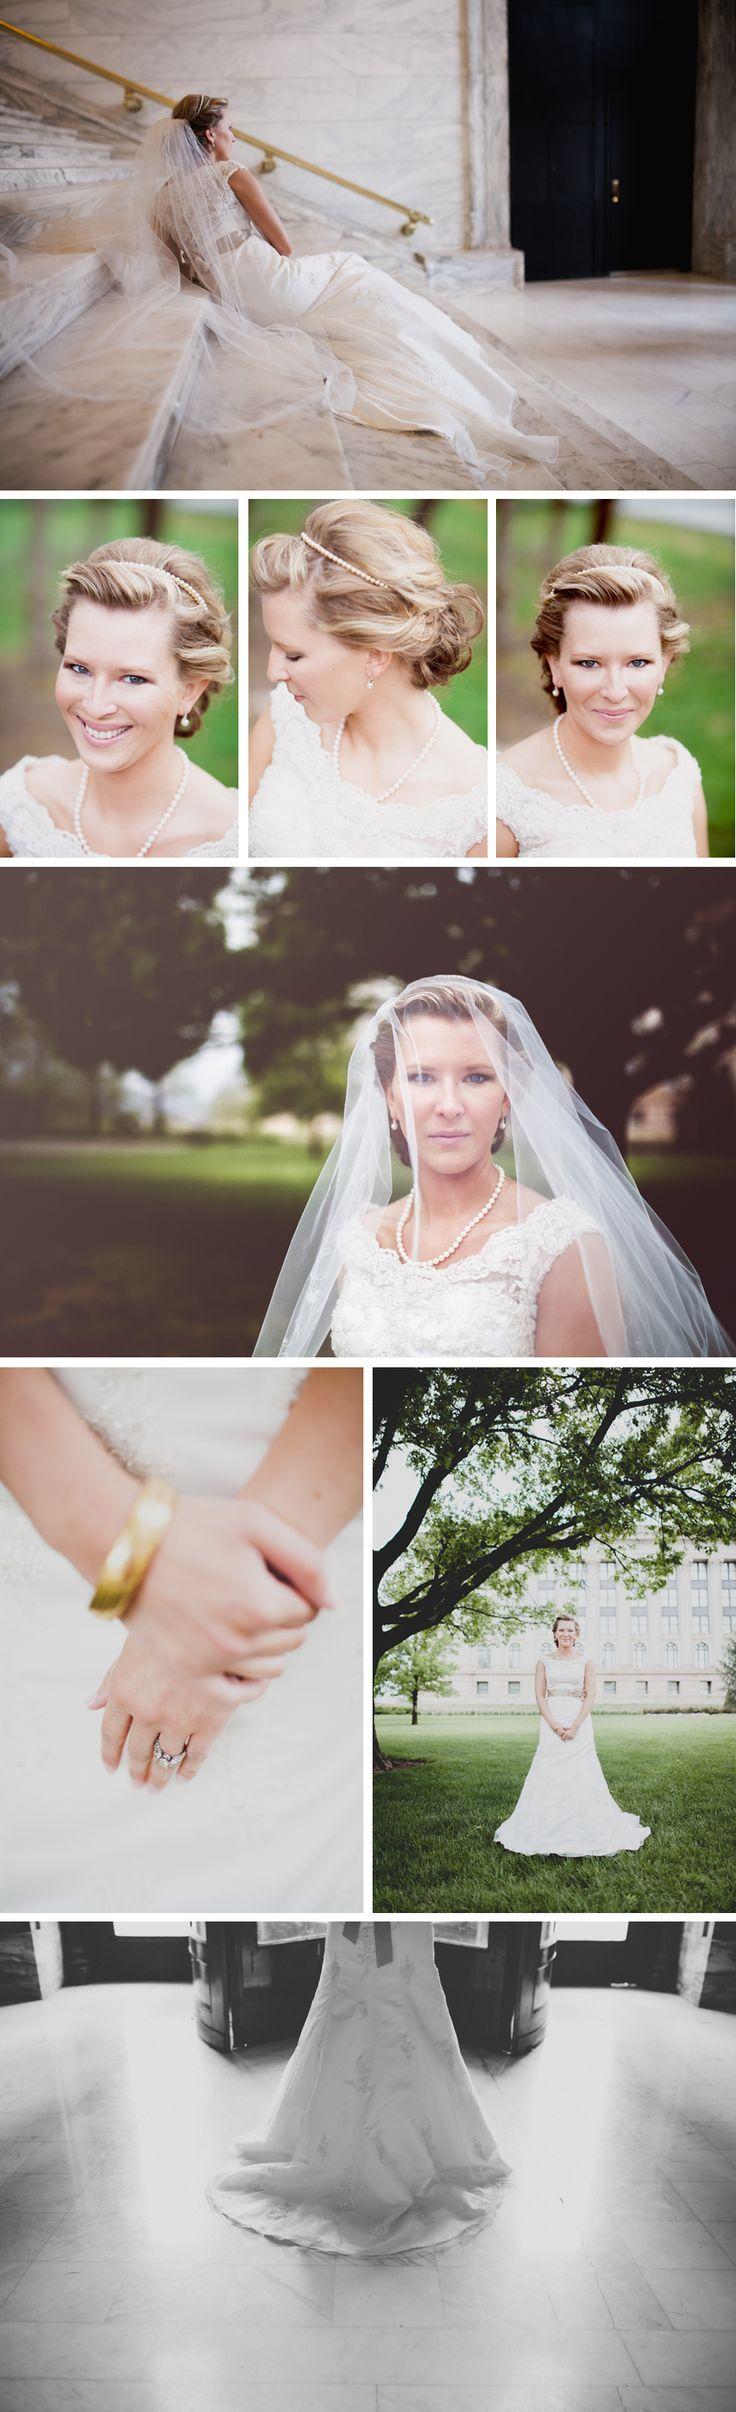 Anna Kraft   Photography Mandy, Bridal Portraits